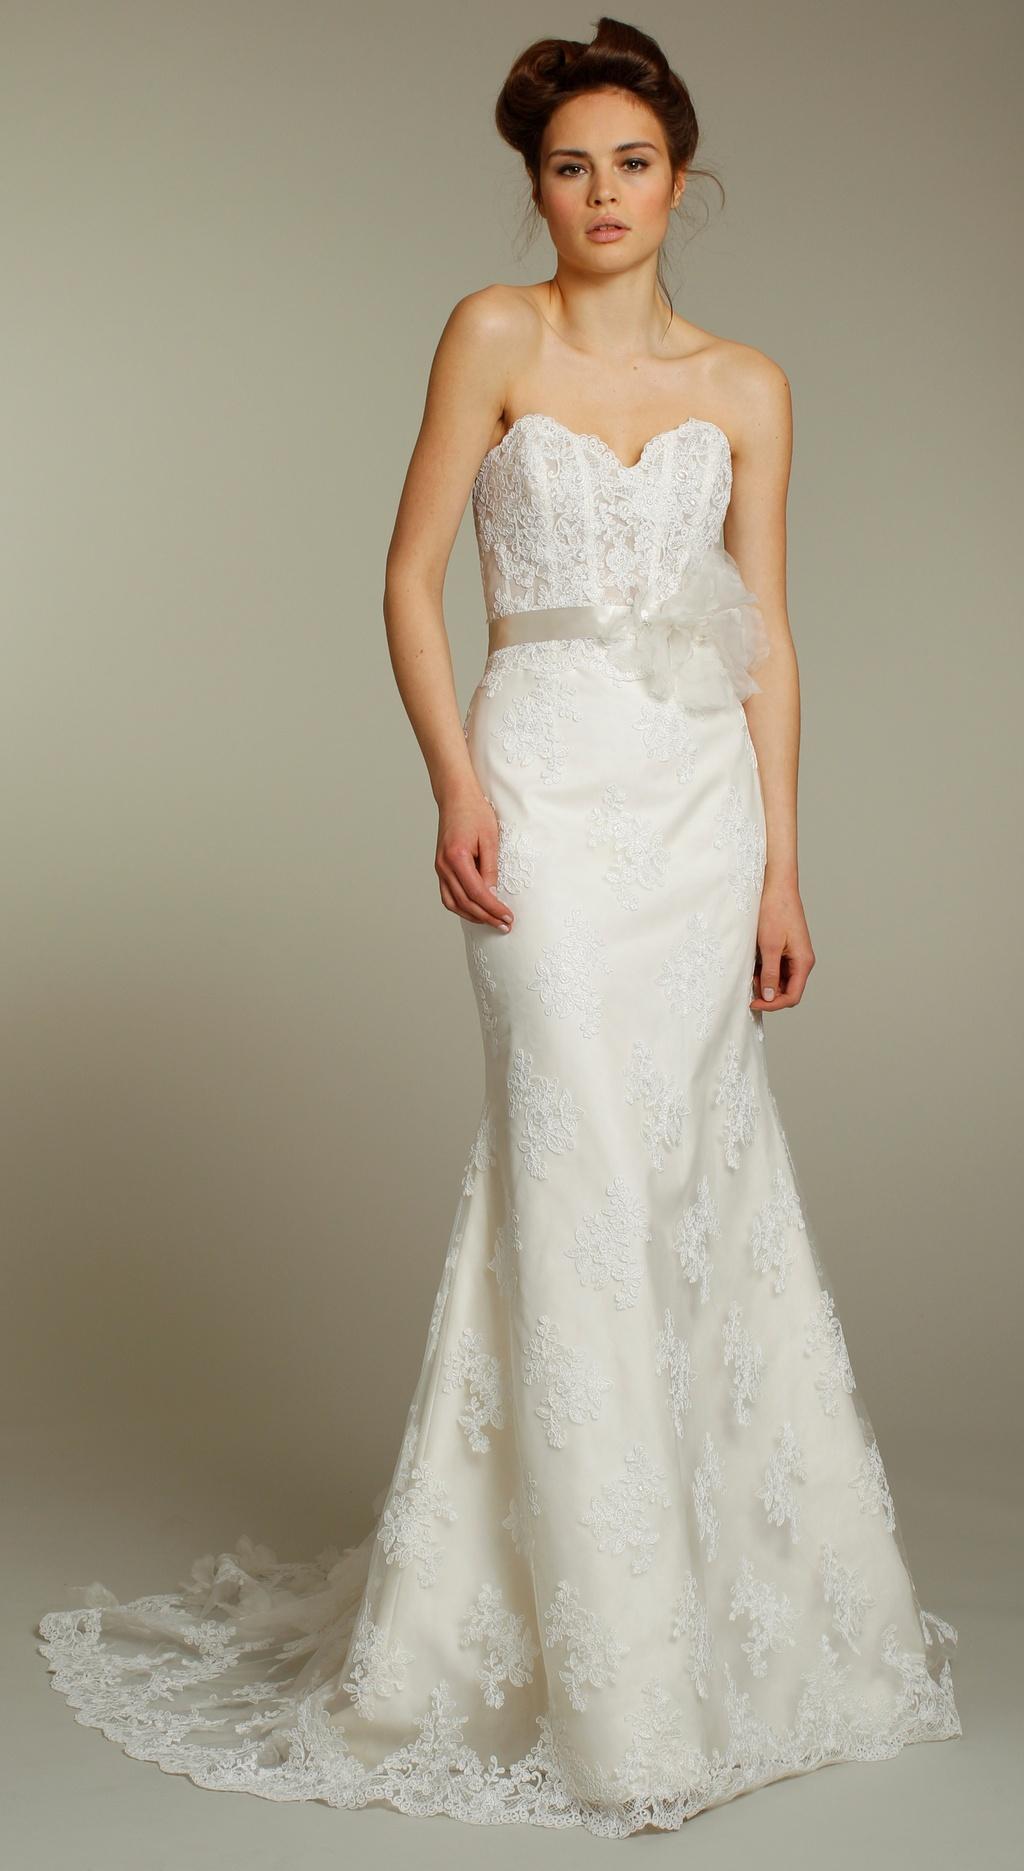 2160-lace-wedding-dress-fall-2011-bridal-gowns-modigied-mermaid-sash.full